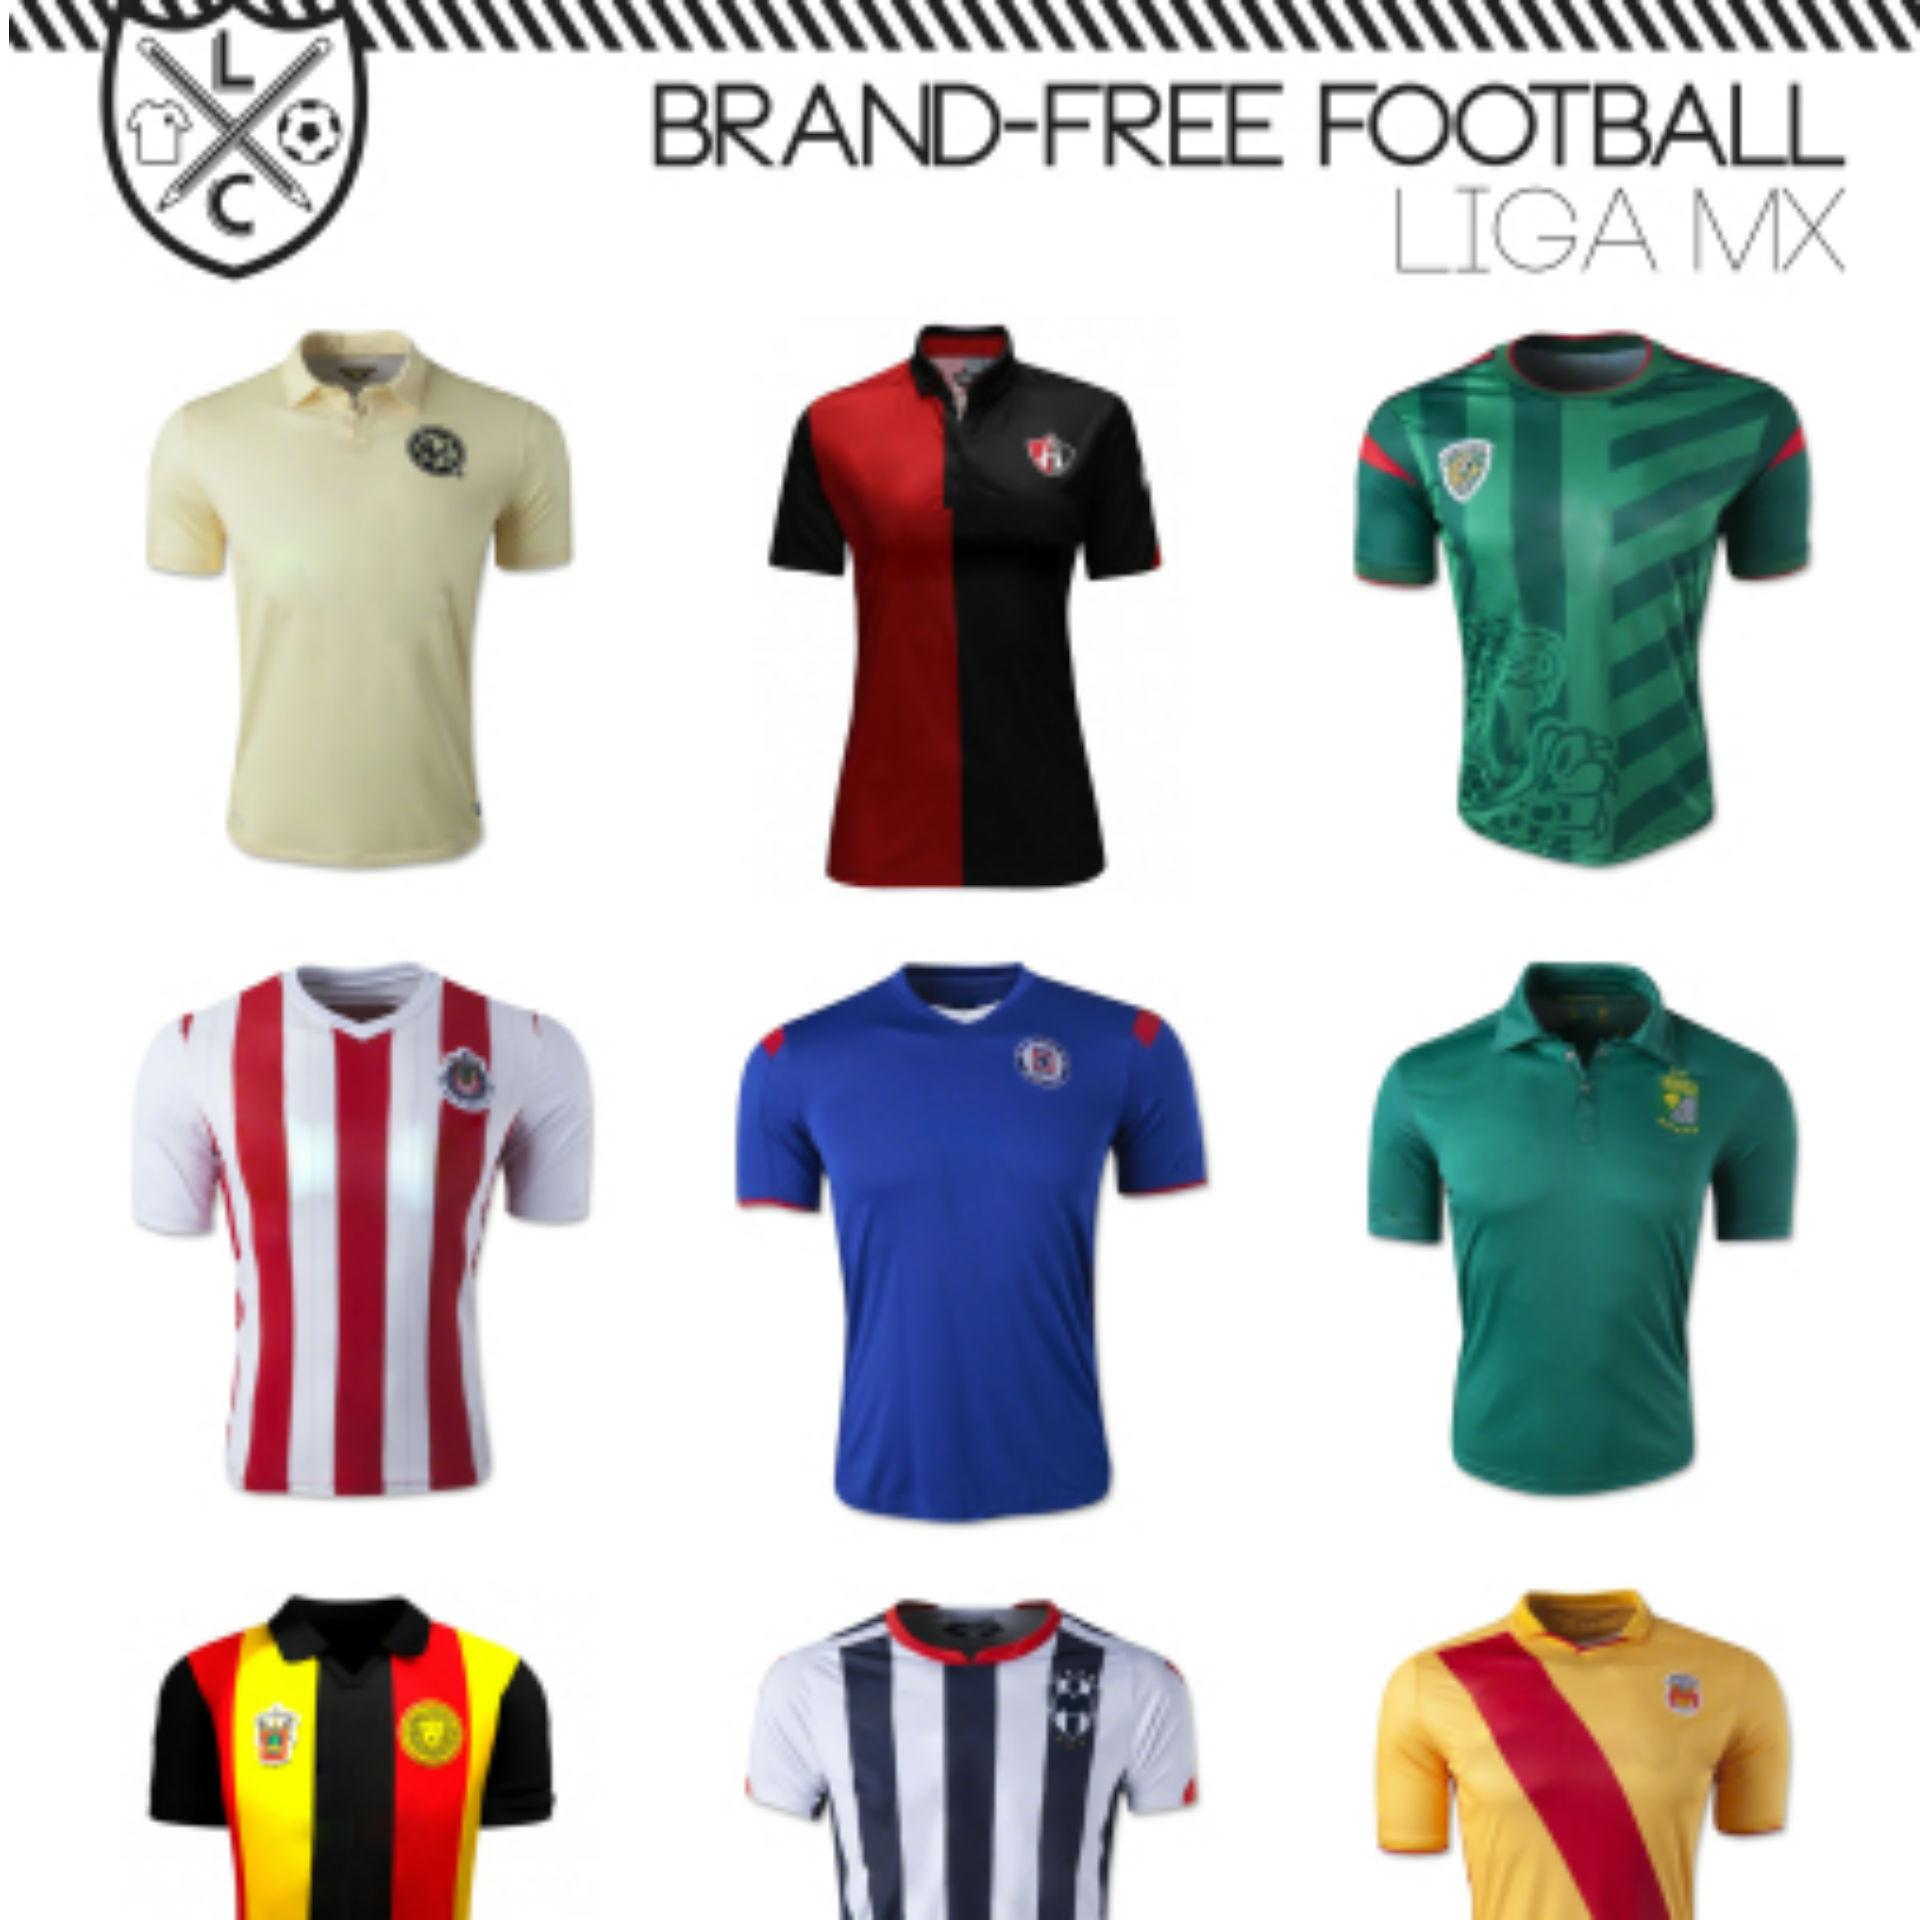 14ab369d9ac6d camisetas-sin-marcas-liga-mx-220115 1jeazzrgp9m0j14xdypvep350r.jpg t 318486715